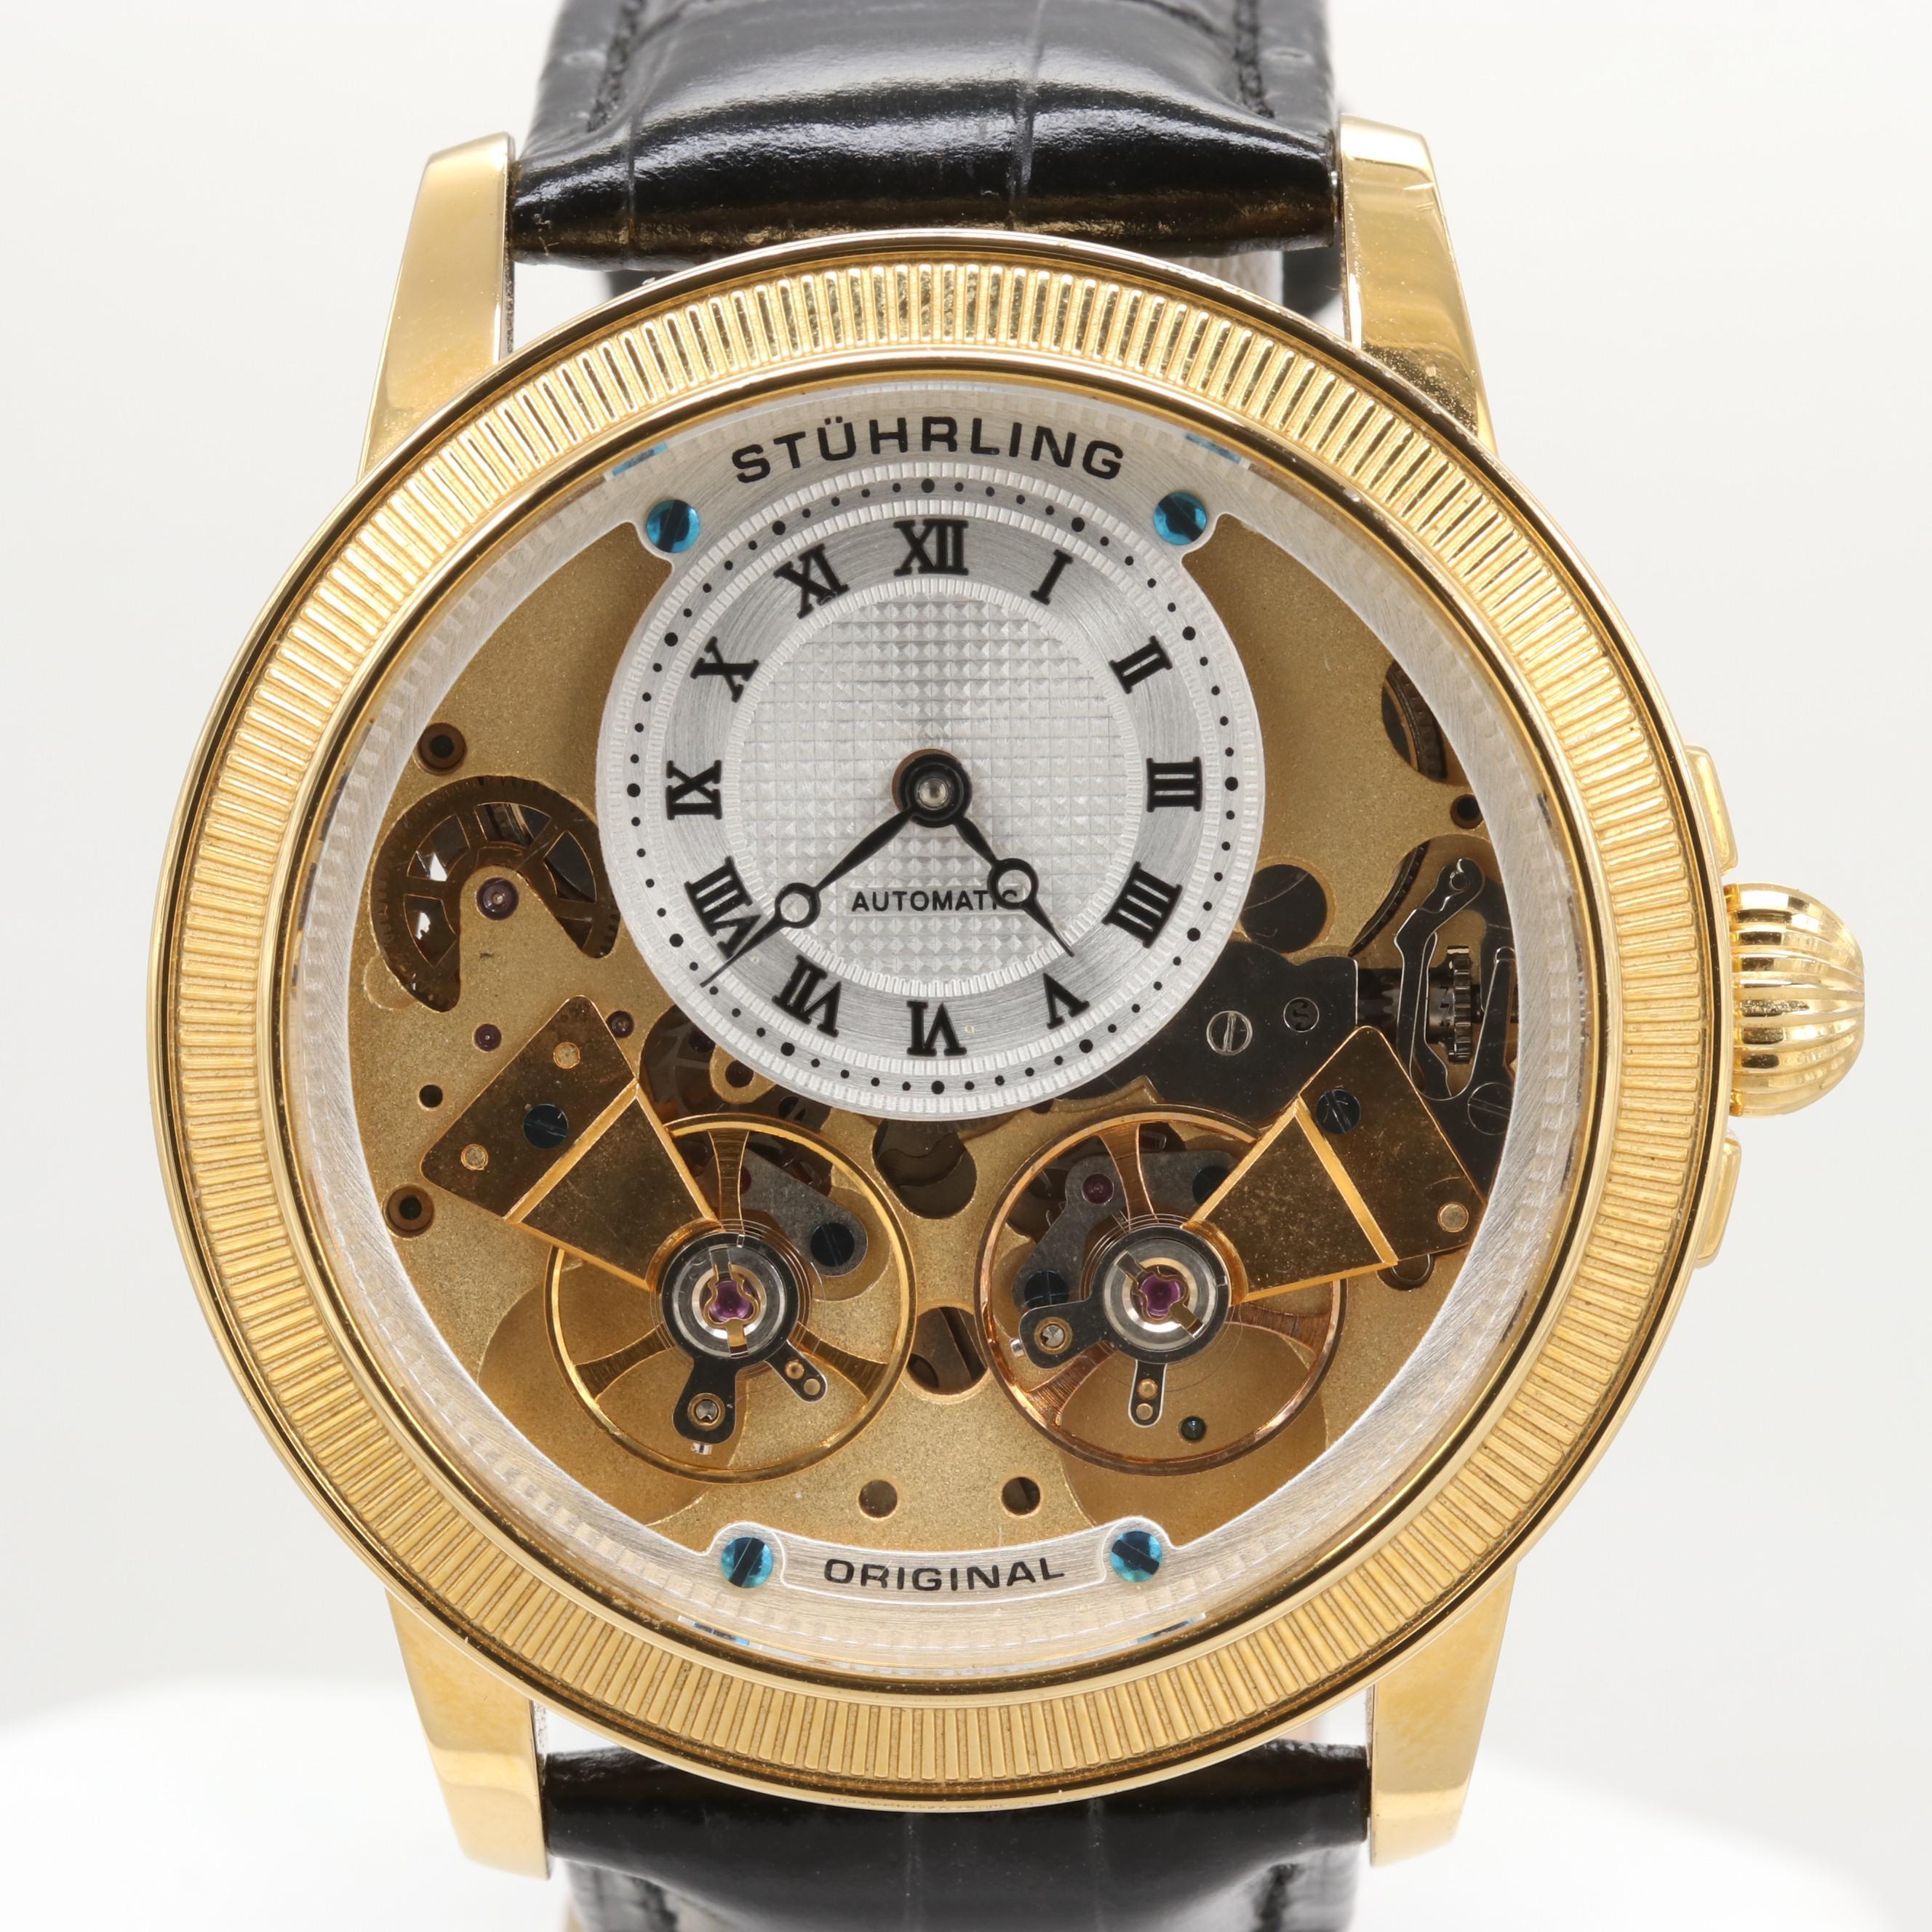 Stuhrling Gemini Double Balance Stainless Steel Skeleton Style Wristwatch